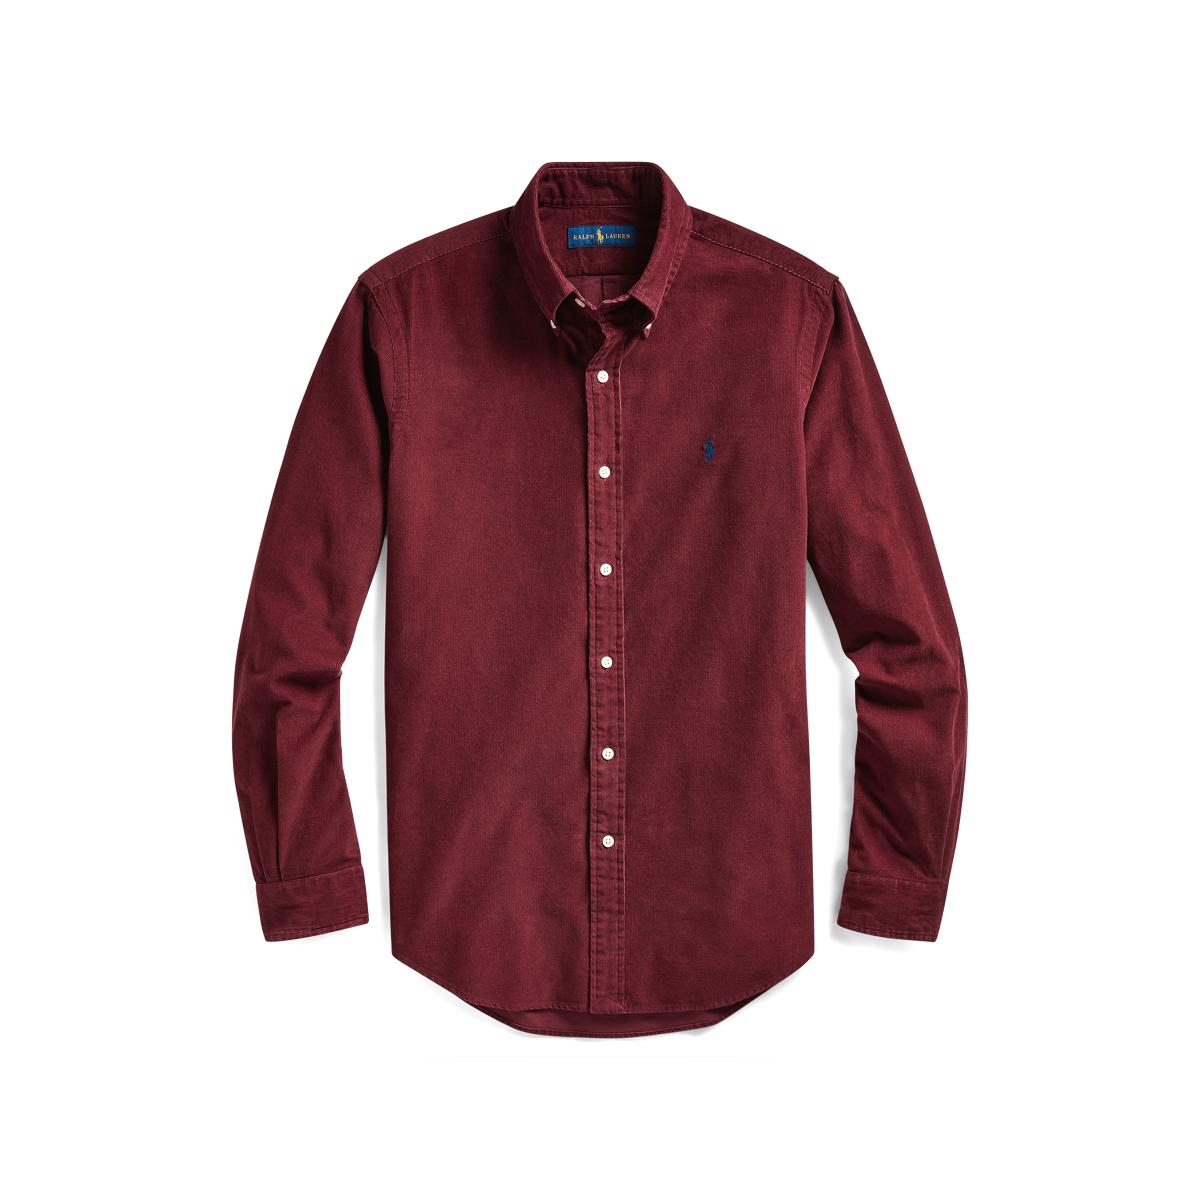 Custom Fit Corduroy Shirt